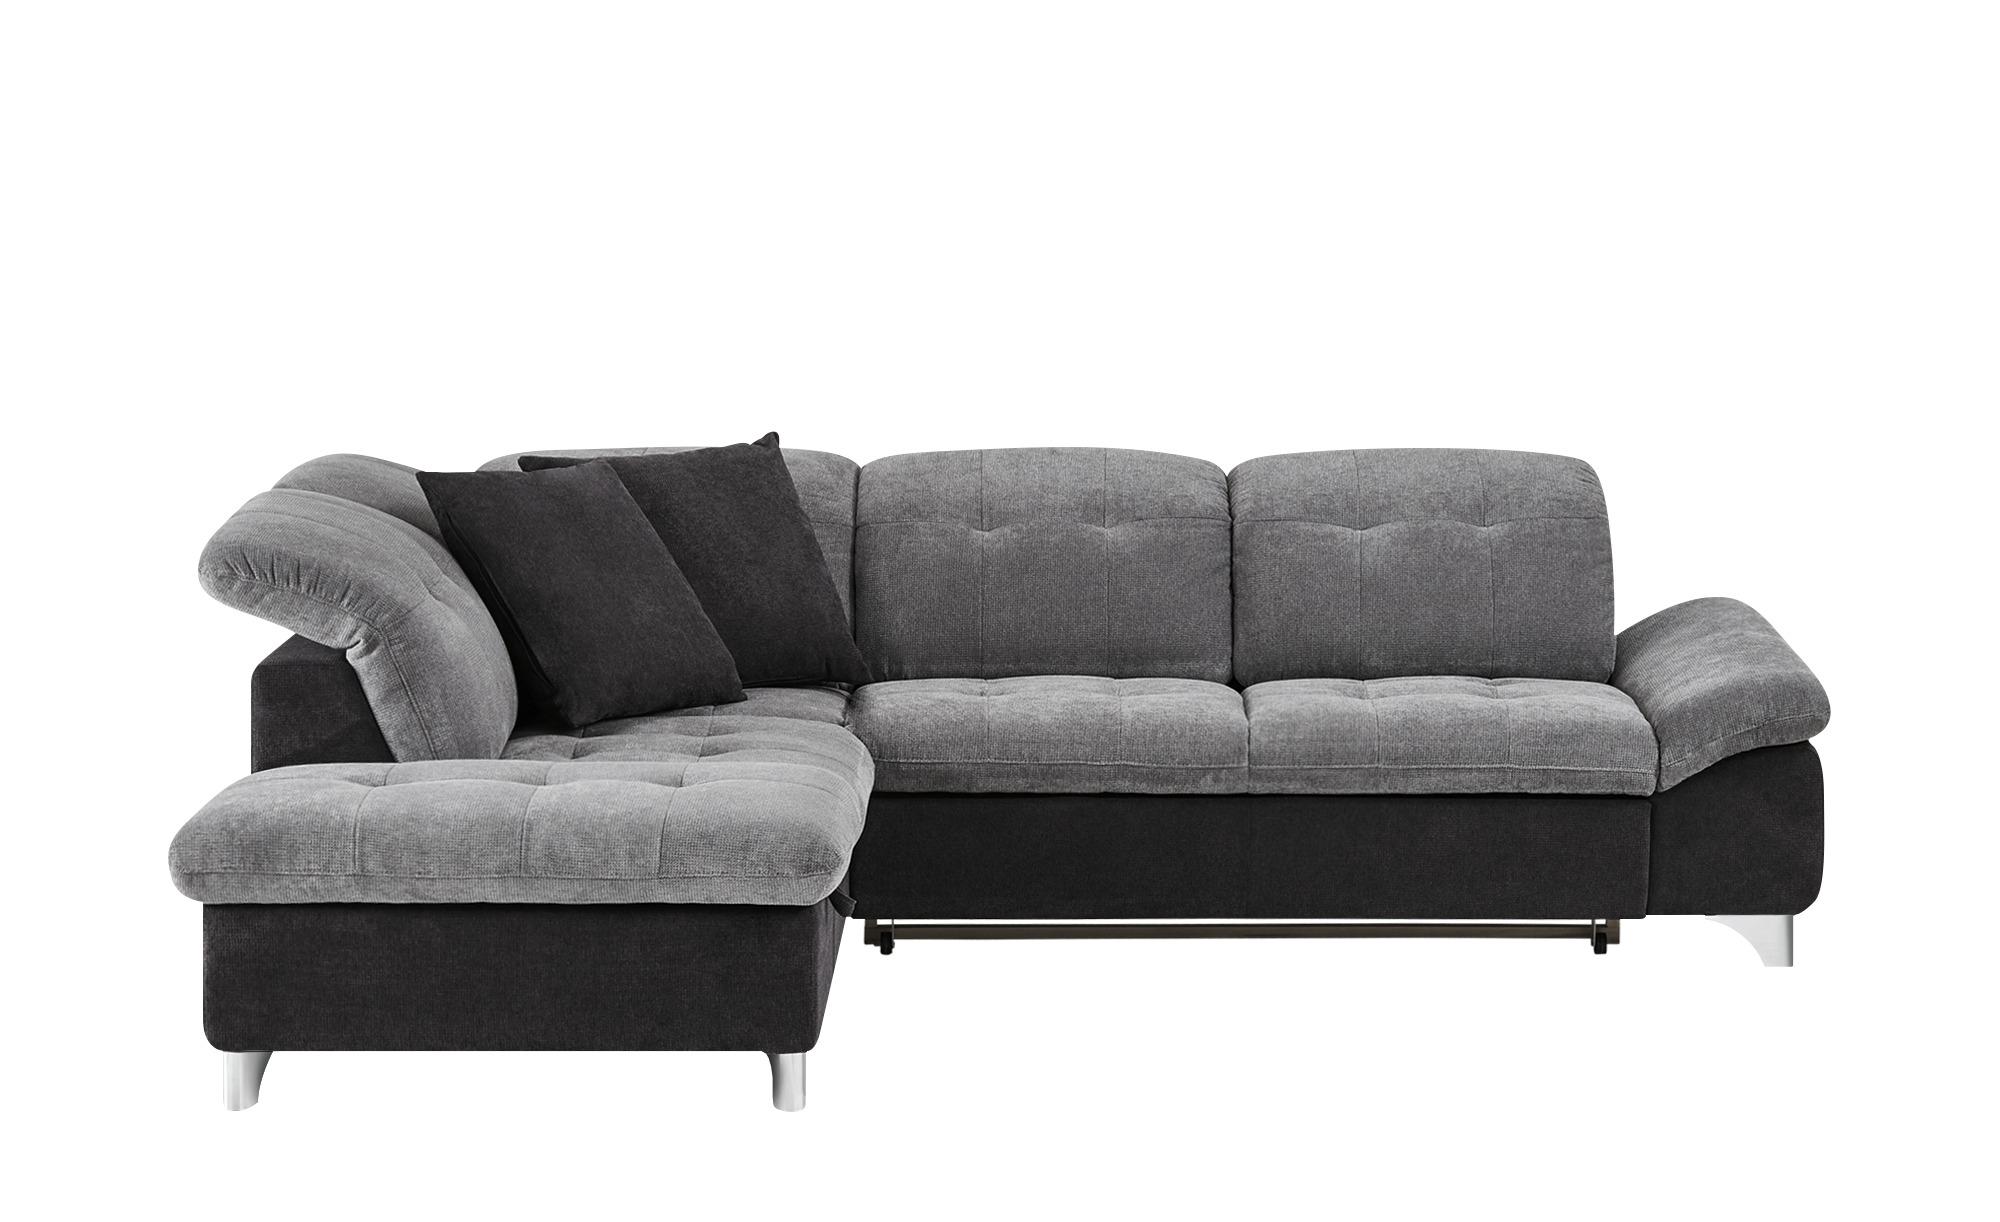 Ecksofa mira breite h he 83 cm grau online kaufen bei woonio for Ecksofa breite 200 cm